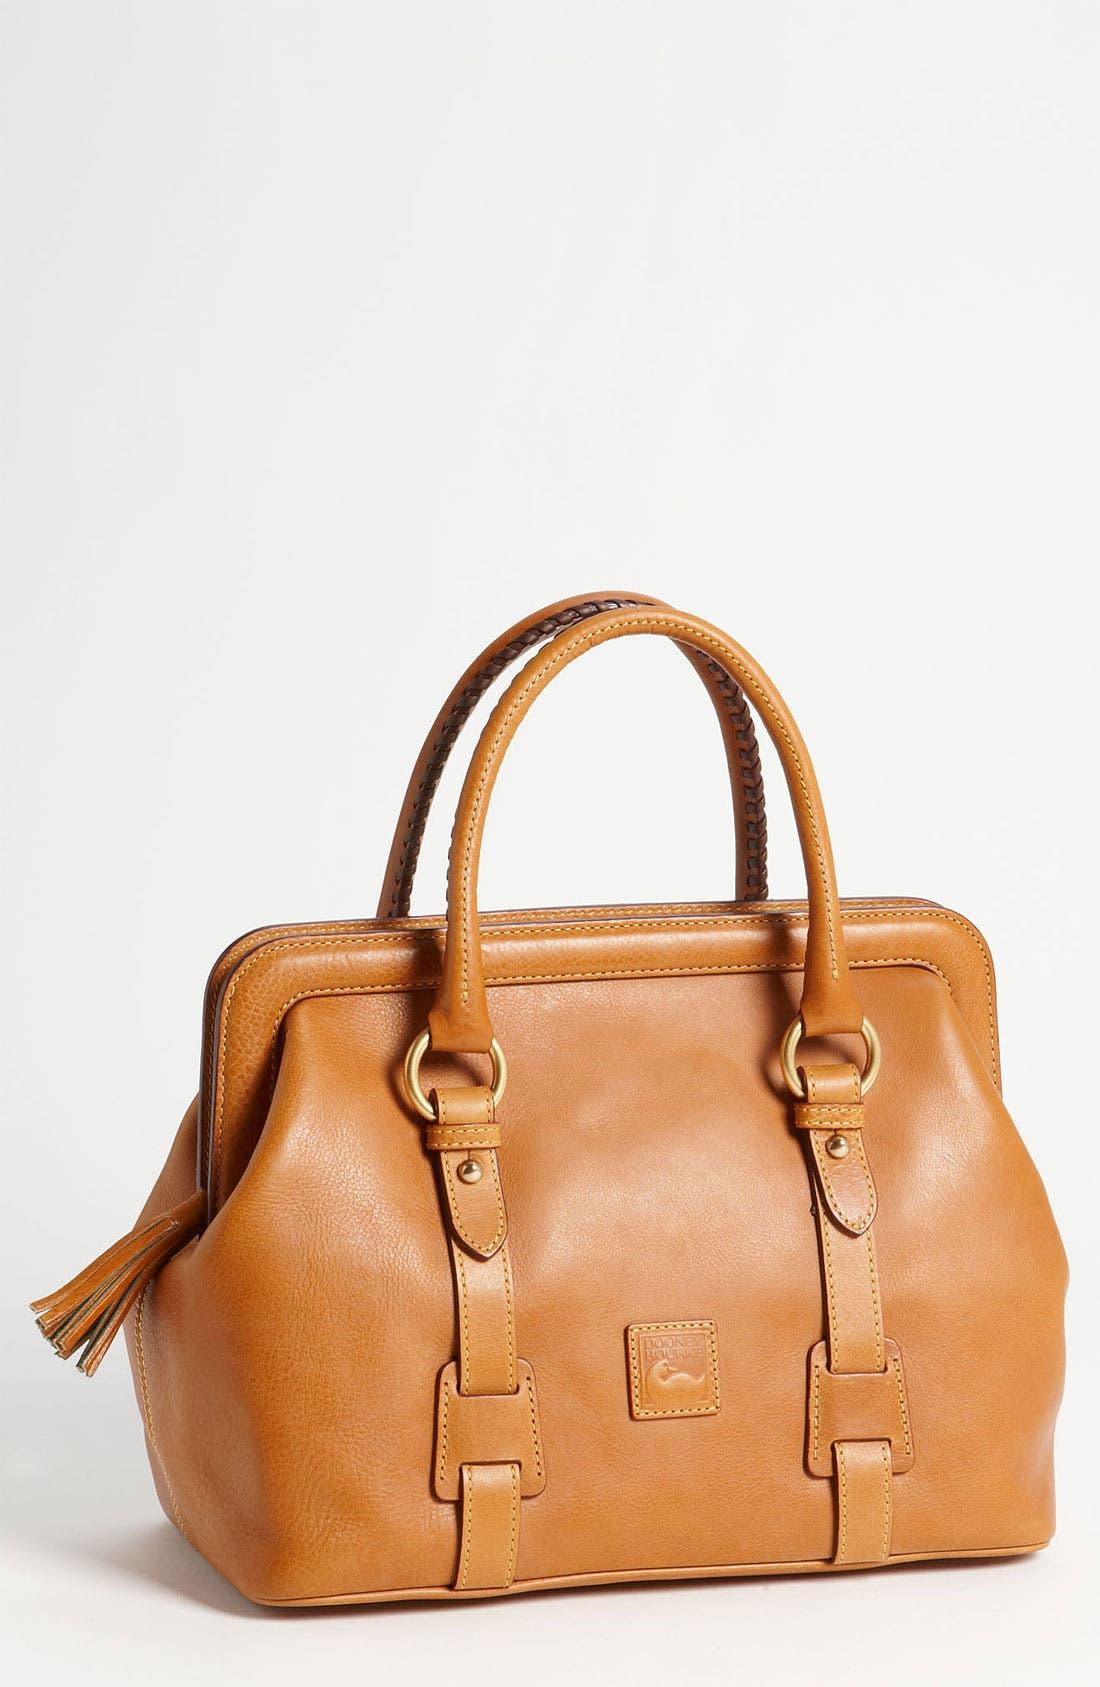 Alternate Image 1 Selected - Dooney & Bourke 'Mitchell' Handbag